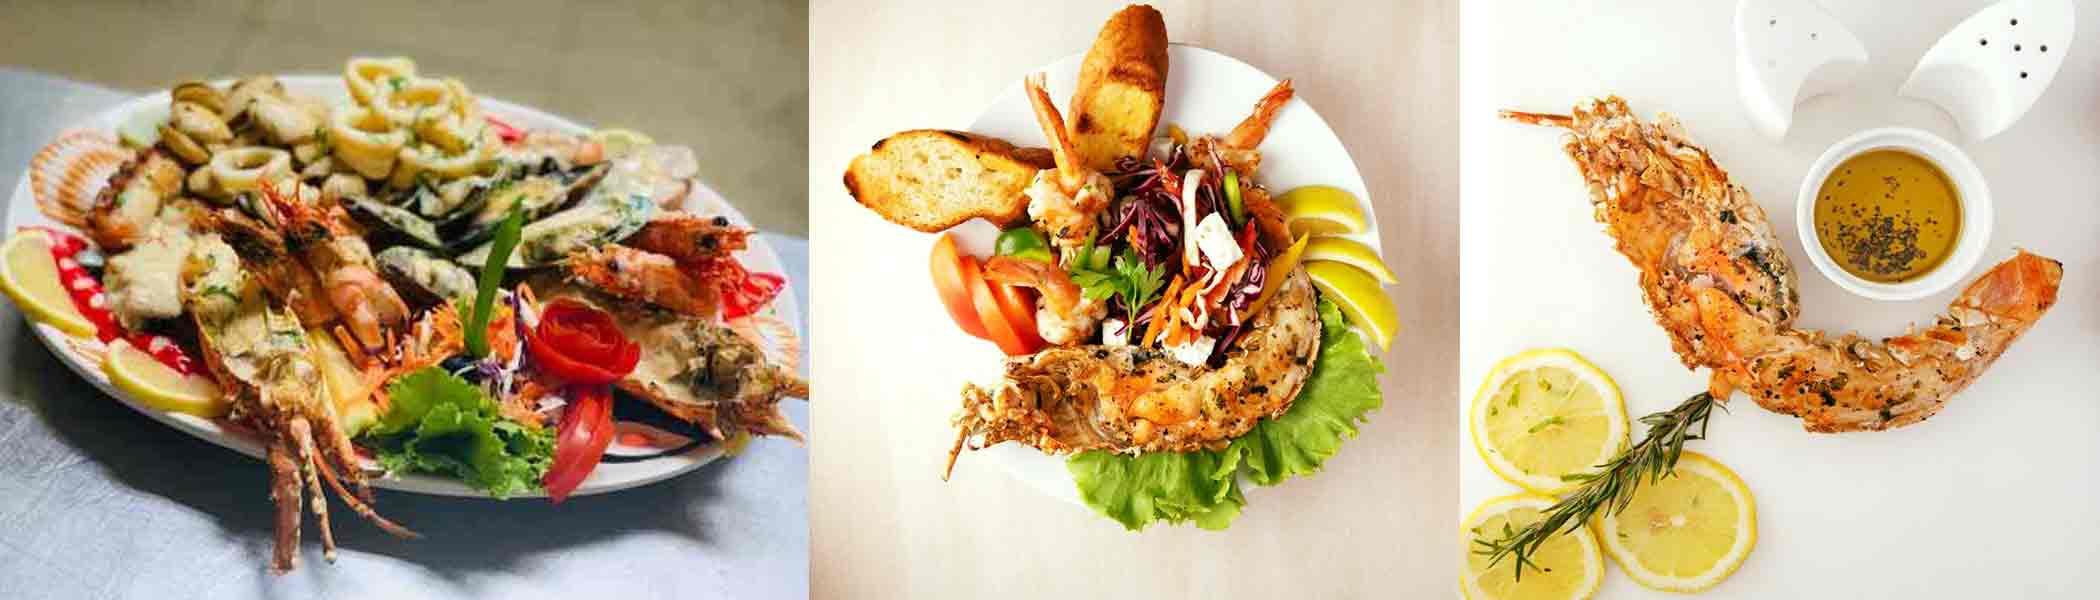 lobster-bay-restaurant, Bars and restaurants in Seychelles Islands